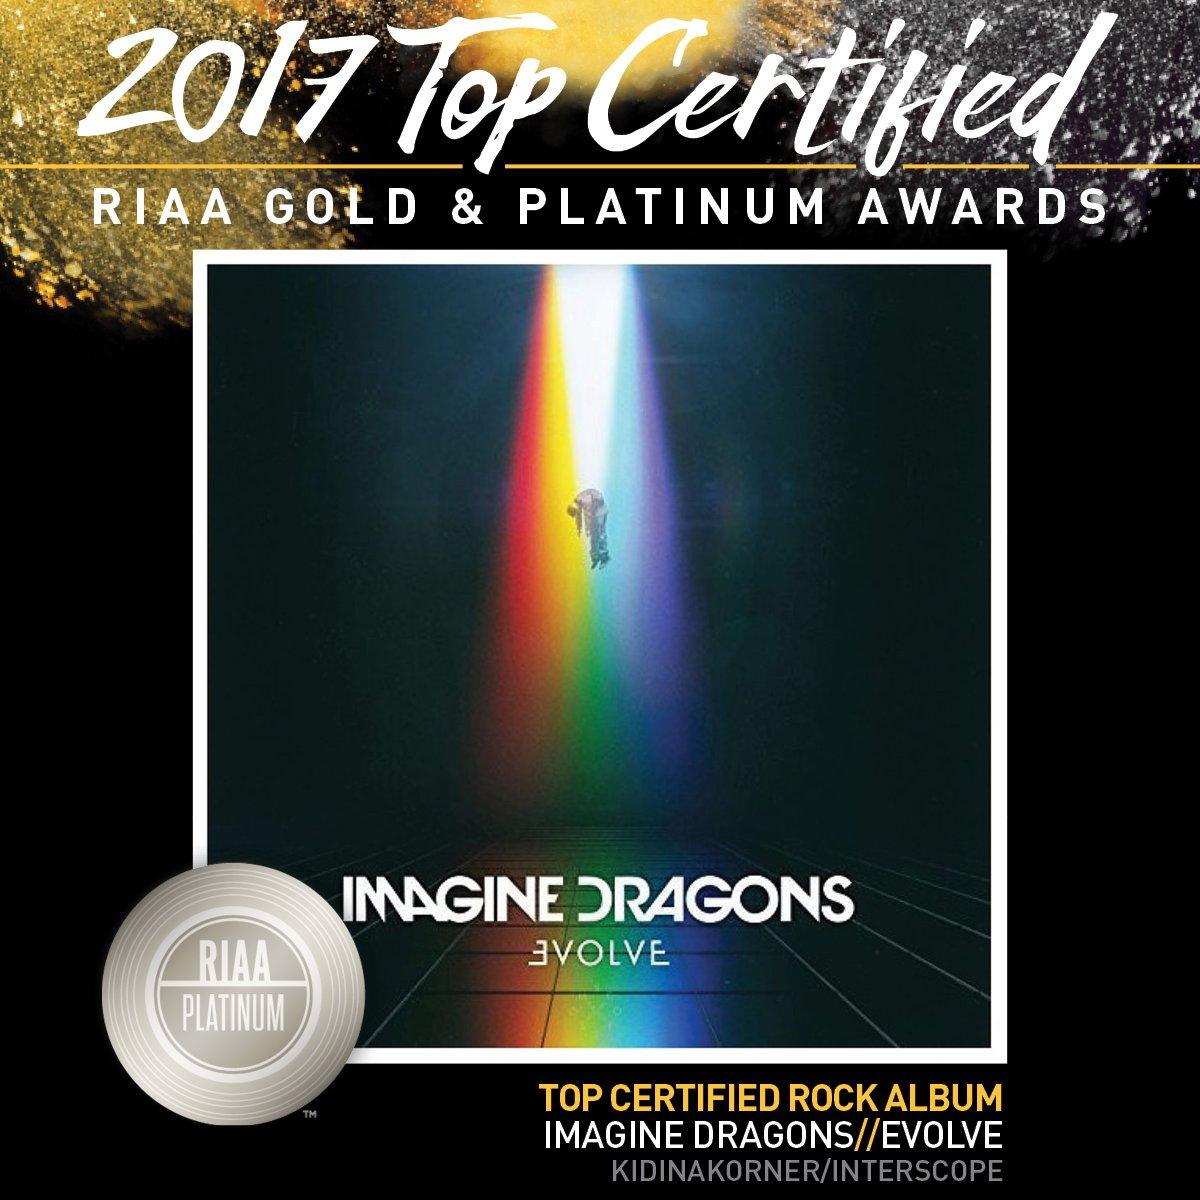 #RIAATopCertified Awards 2017's #1 Rock...